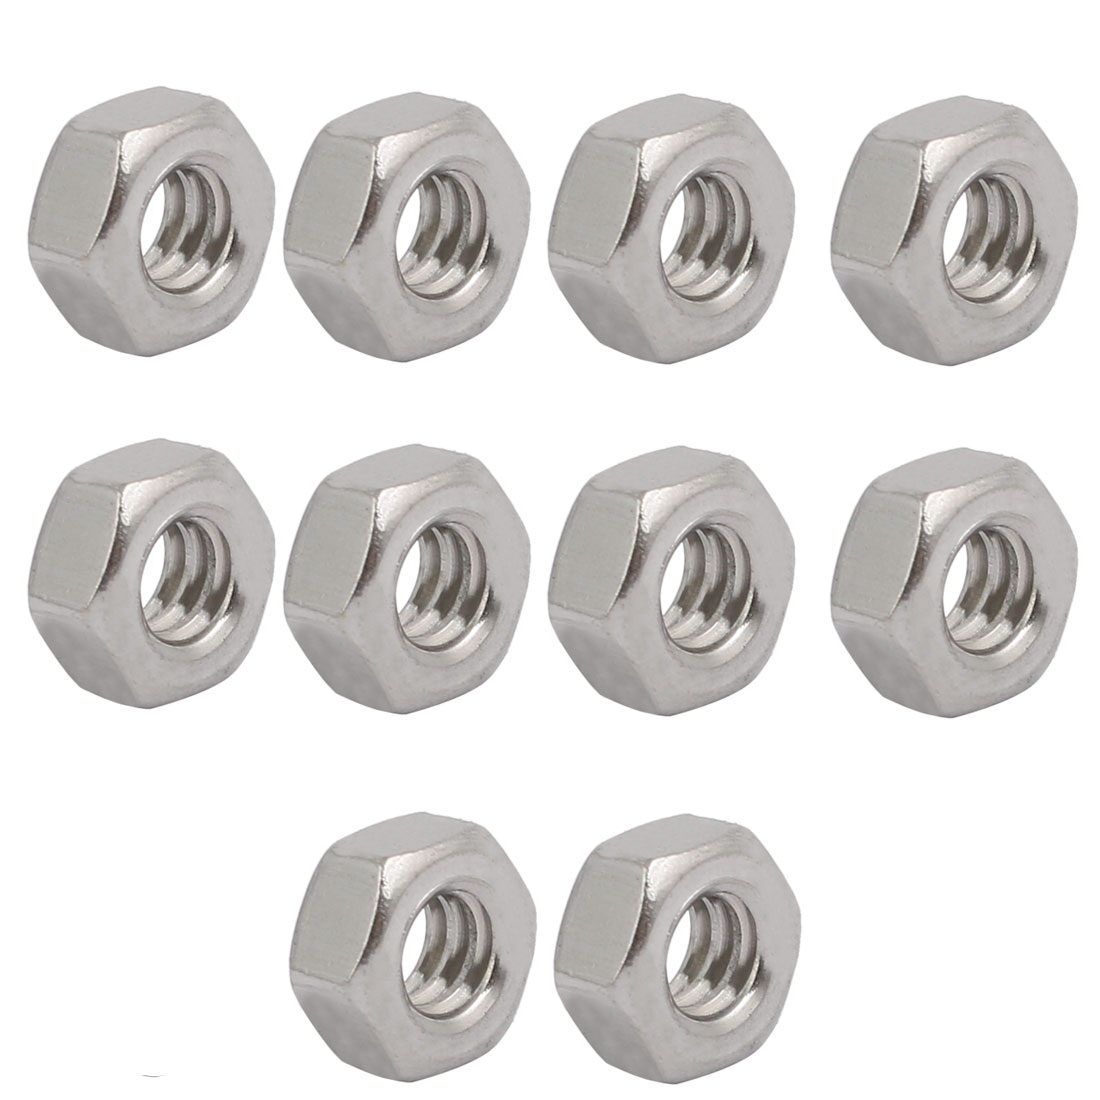 "10pcs 3/16""-24 BSW Thread 304 Stainless Steel Hex Nut Fastener Silver Tone"